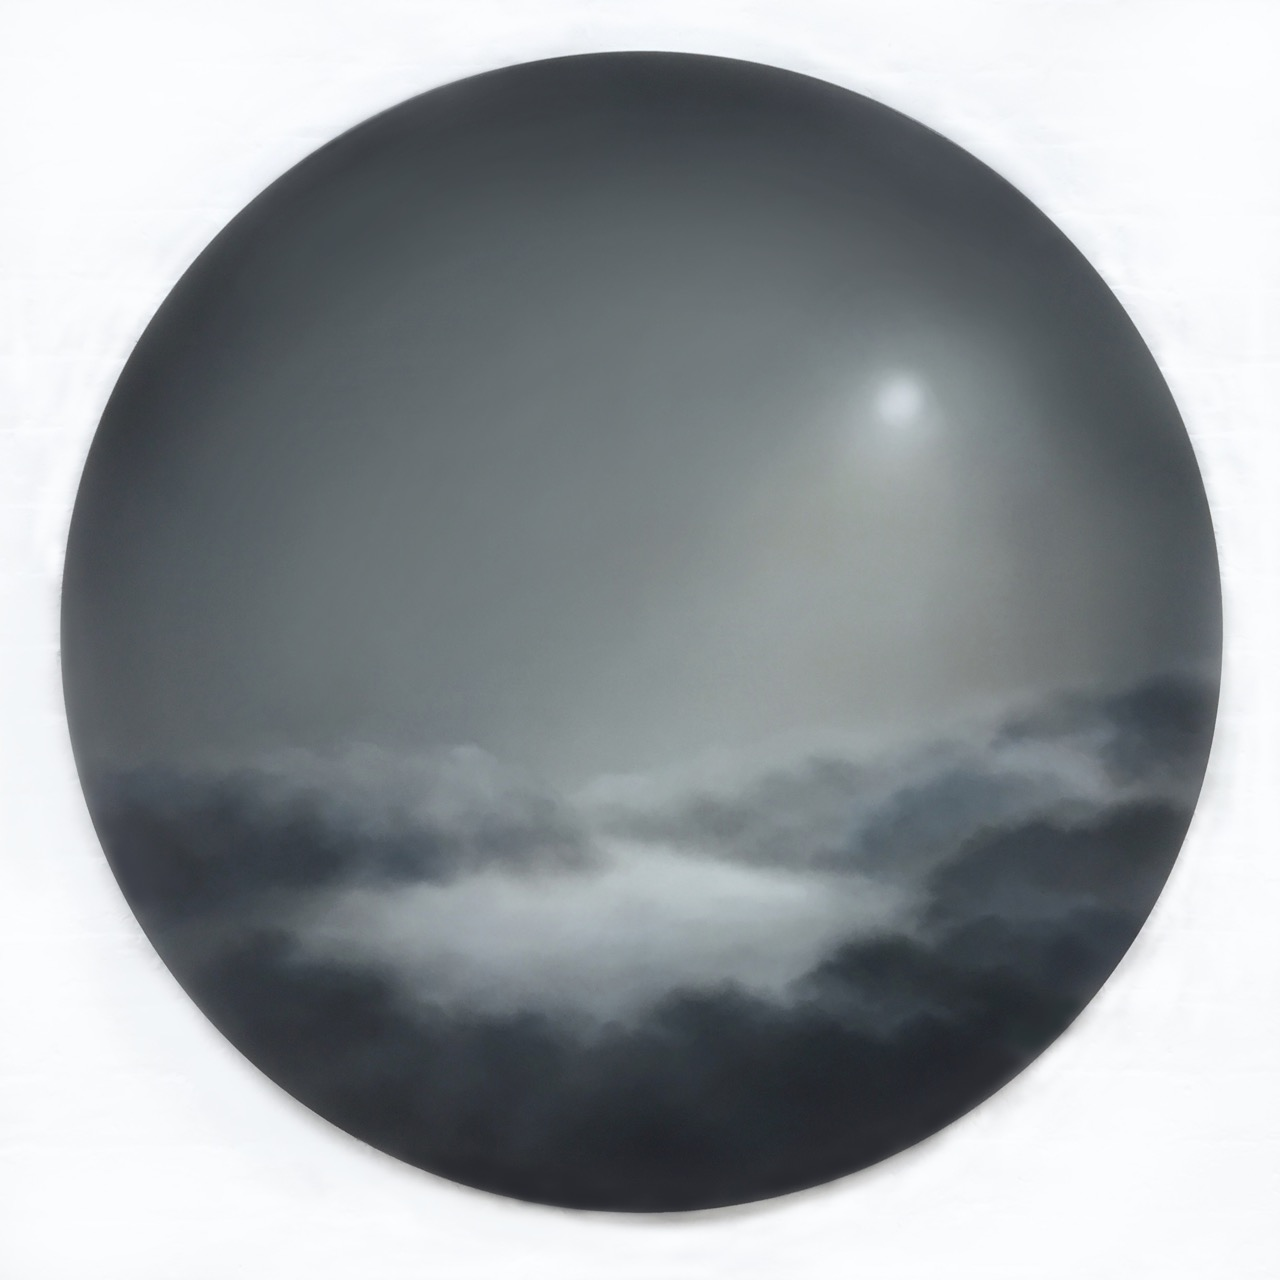 Where The Light Gets In, oil on wood, 122 x 122cm, 2019 London Art Fair, Stand 39, GBS Fine Art